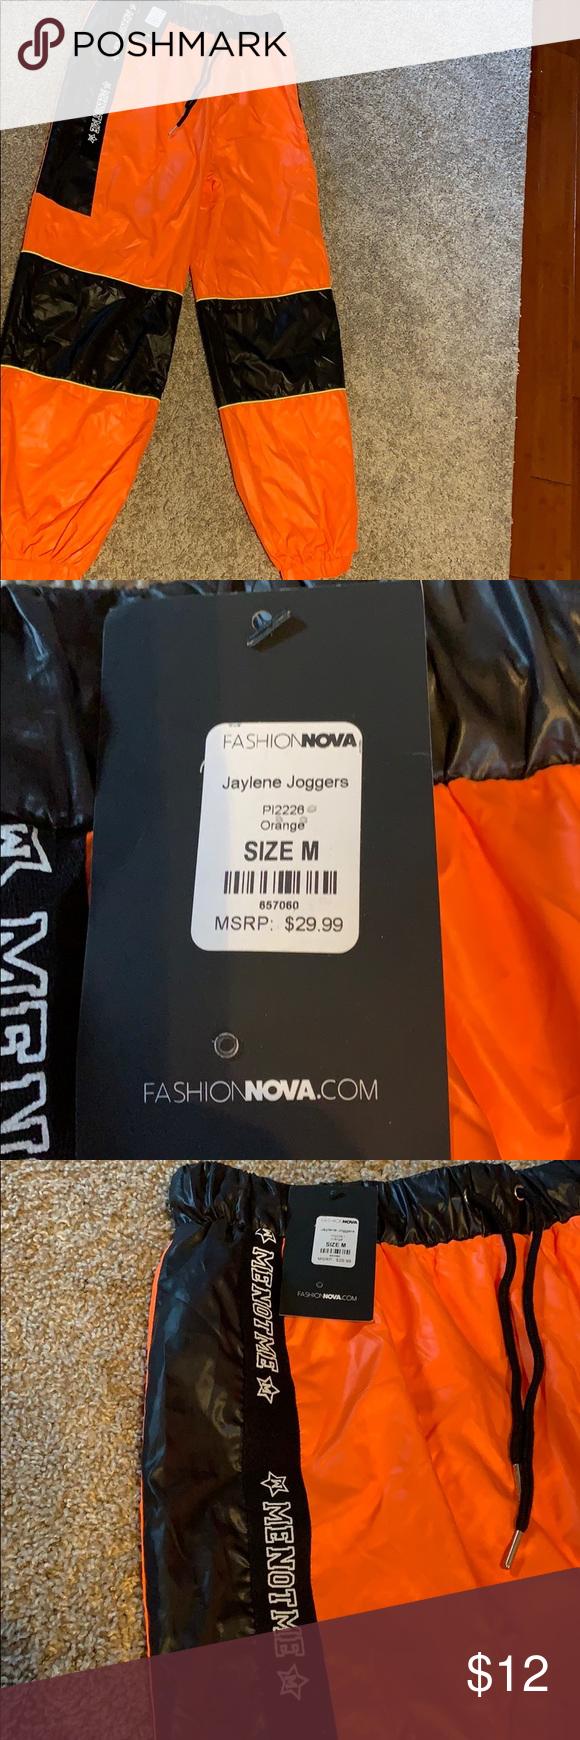 Fashion Nova Jaylene Joggers Fashion Nova Fashion Fashion Nova Pants